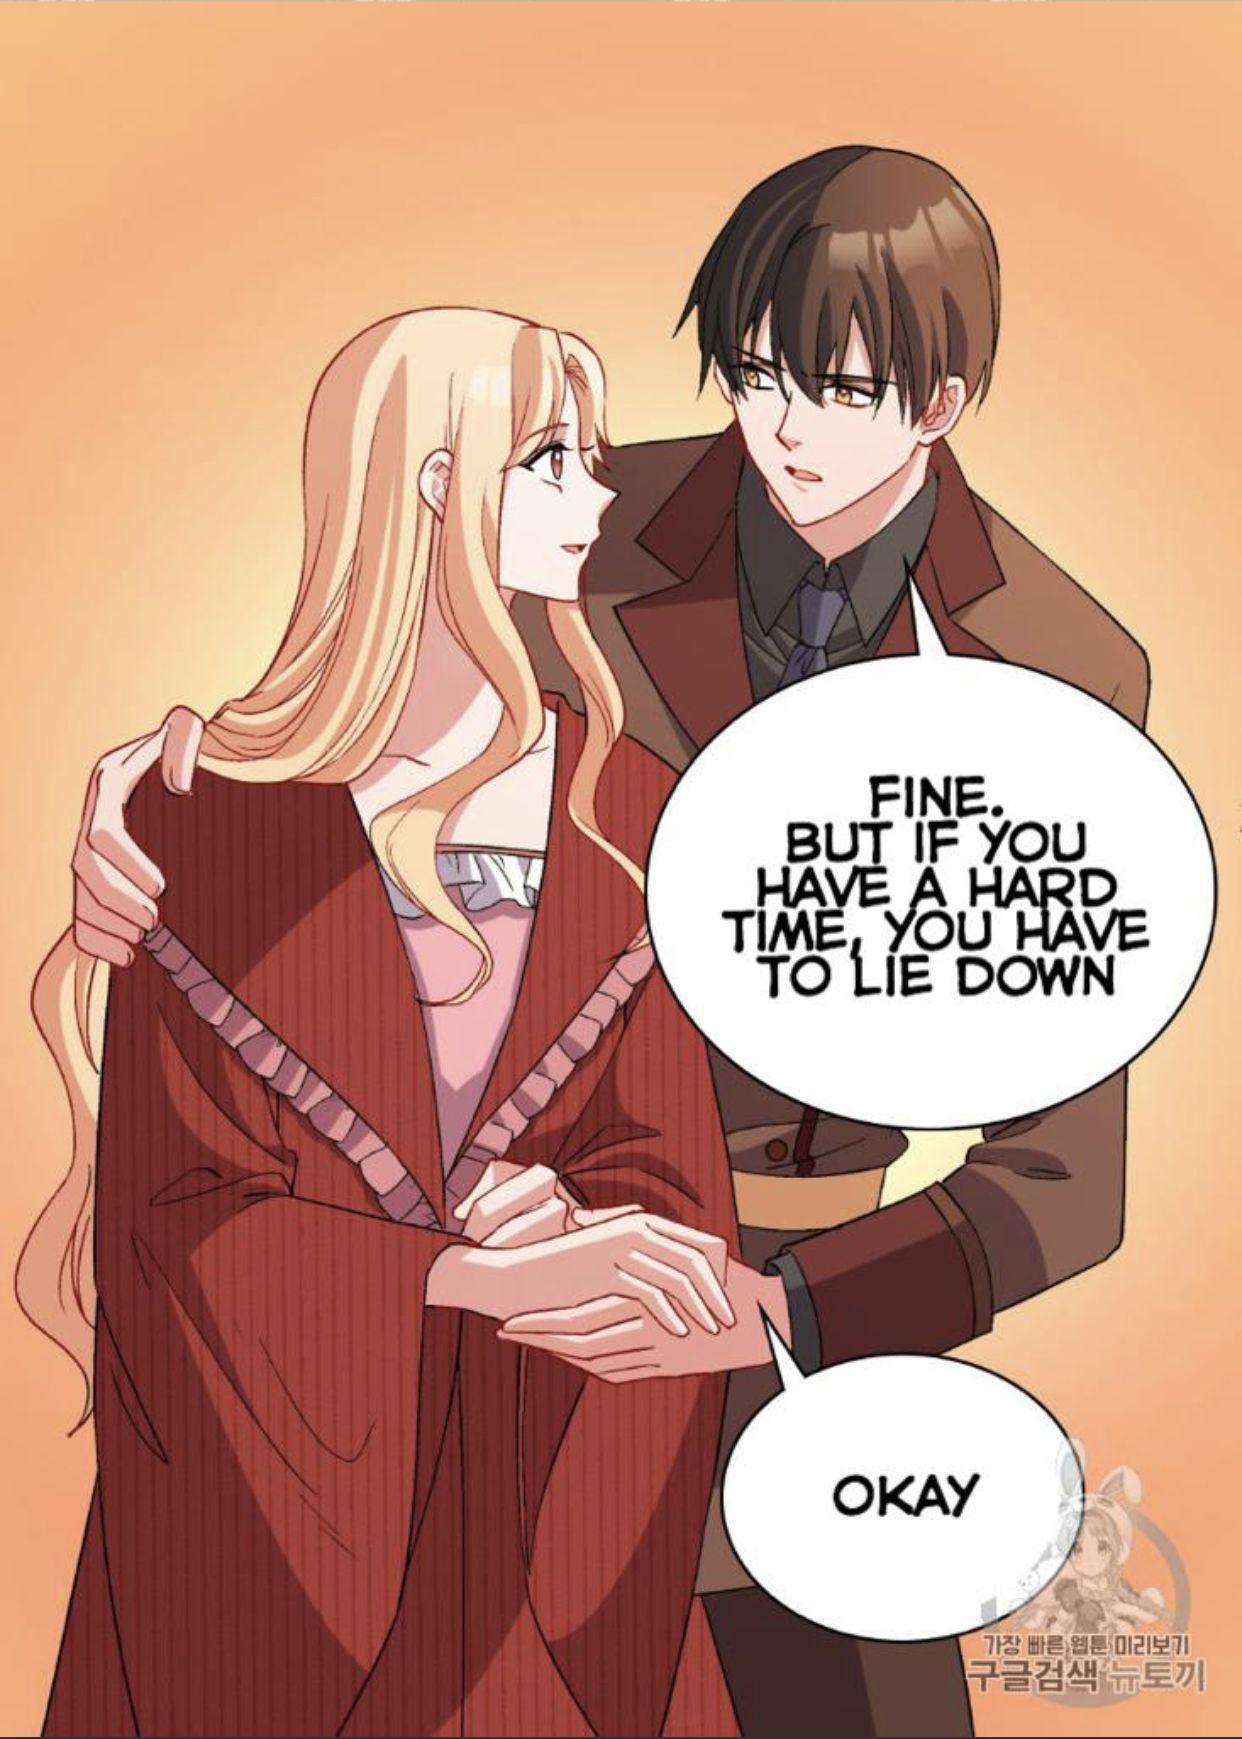 Pin on The Justice Of Villainous Woman Manga